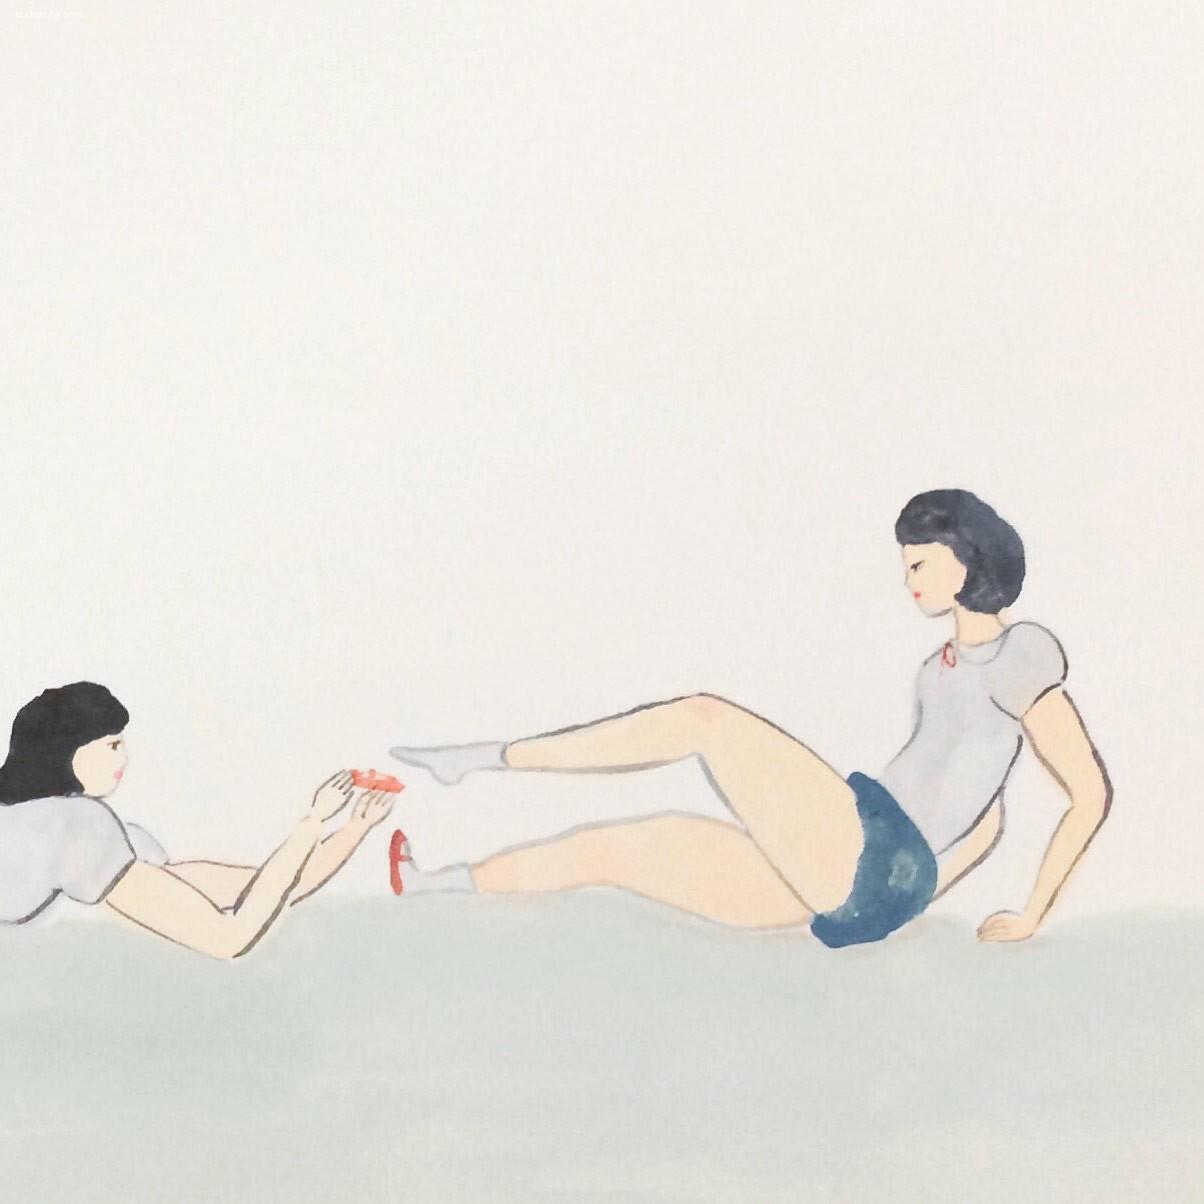 Hidemi Ito 插画作品欣赏